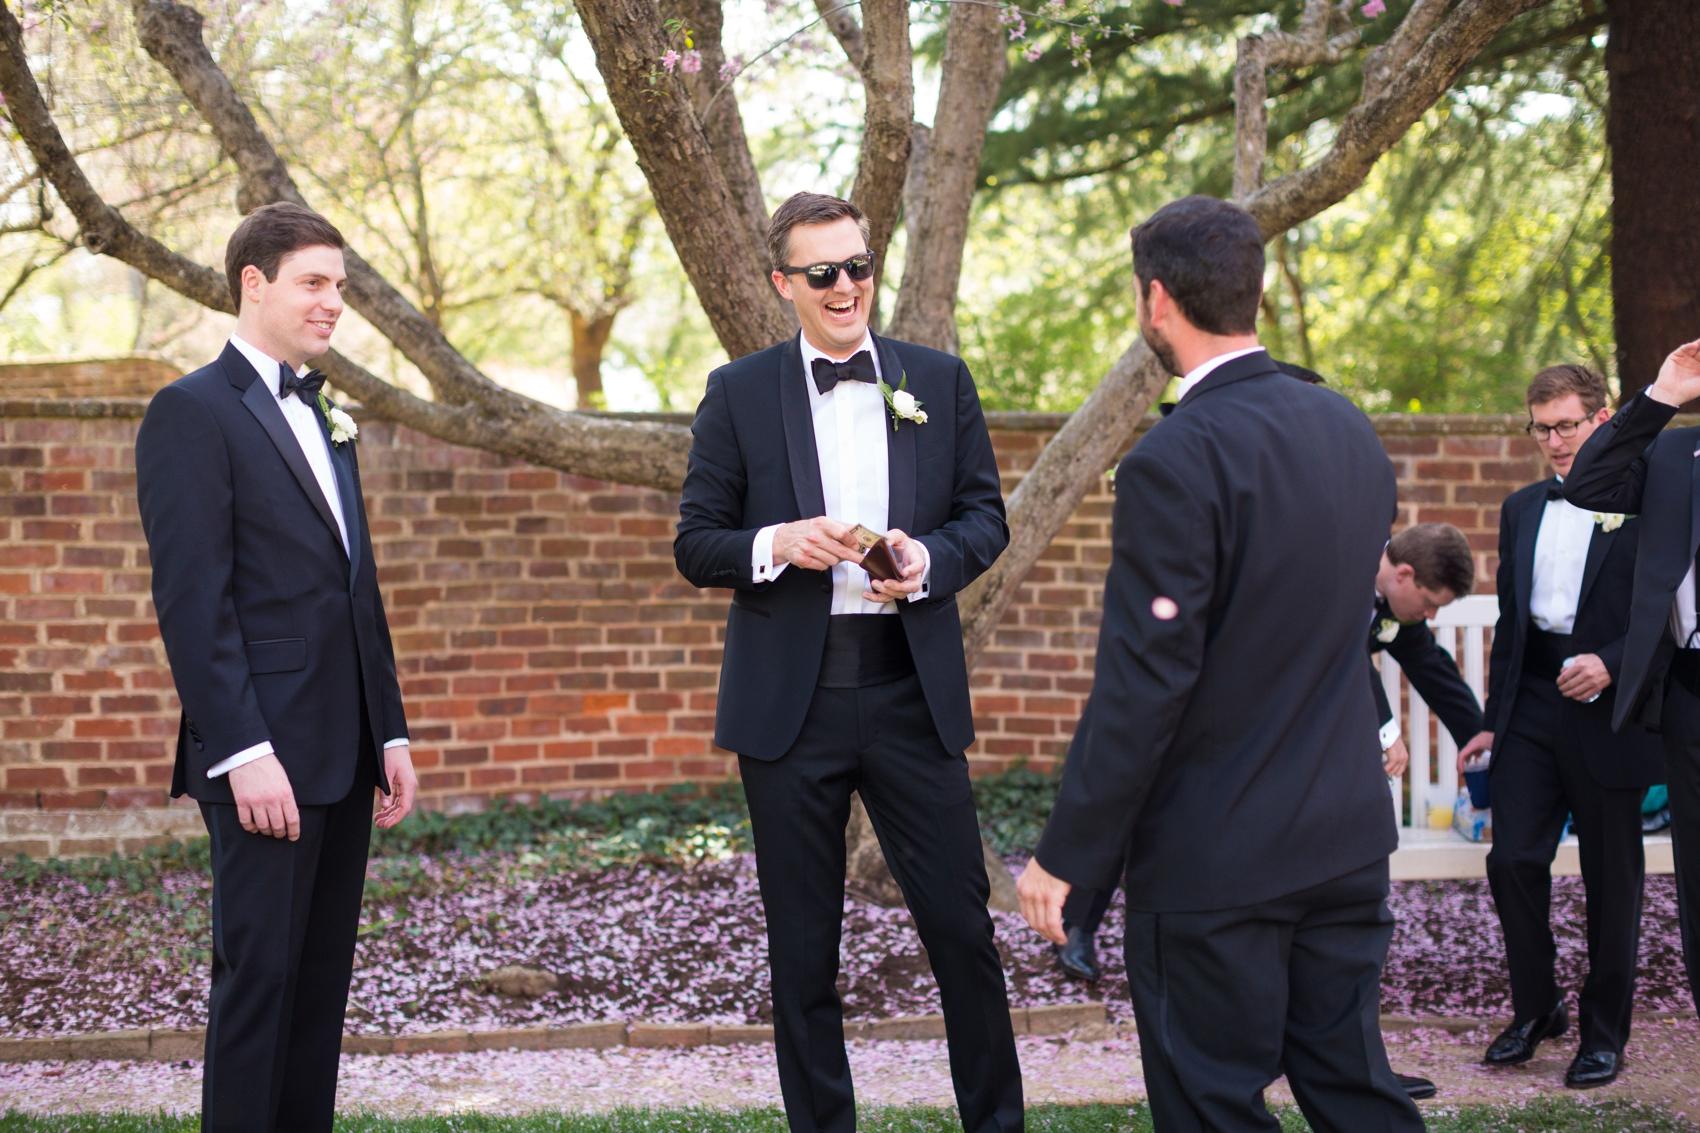 Castle-Hill-Virginia-Wedding-2019-0486.jpg